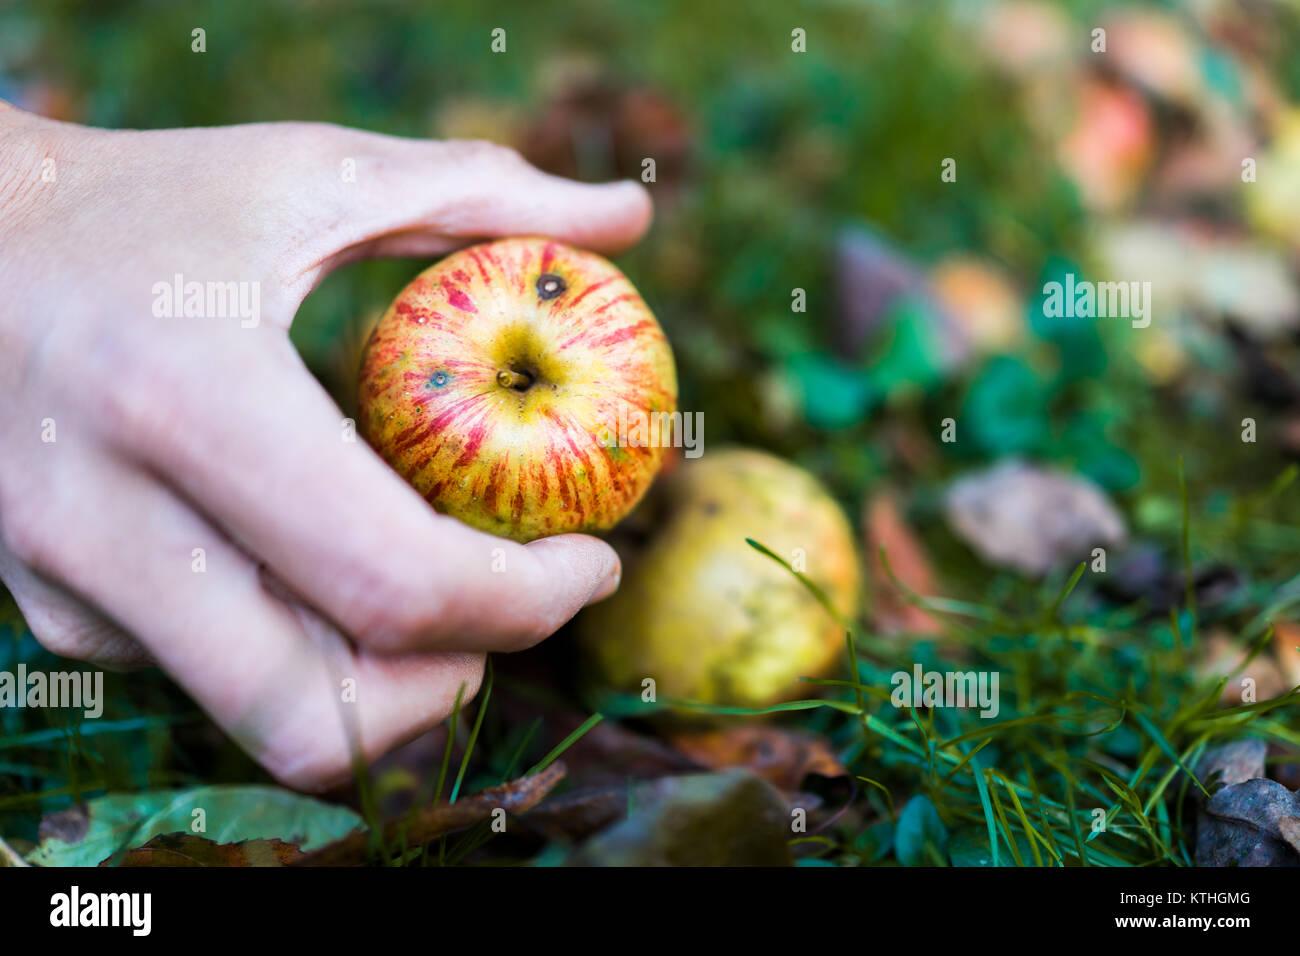 Man hands picking up one apple fallen wild fresh on grass ground bruised on apple picking farm closeup - Stock Image